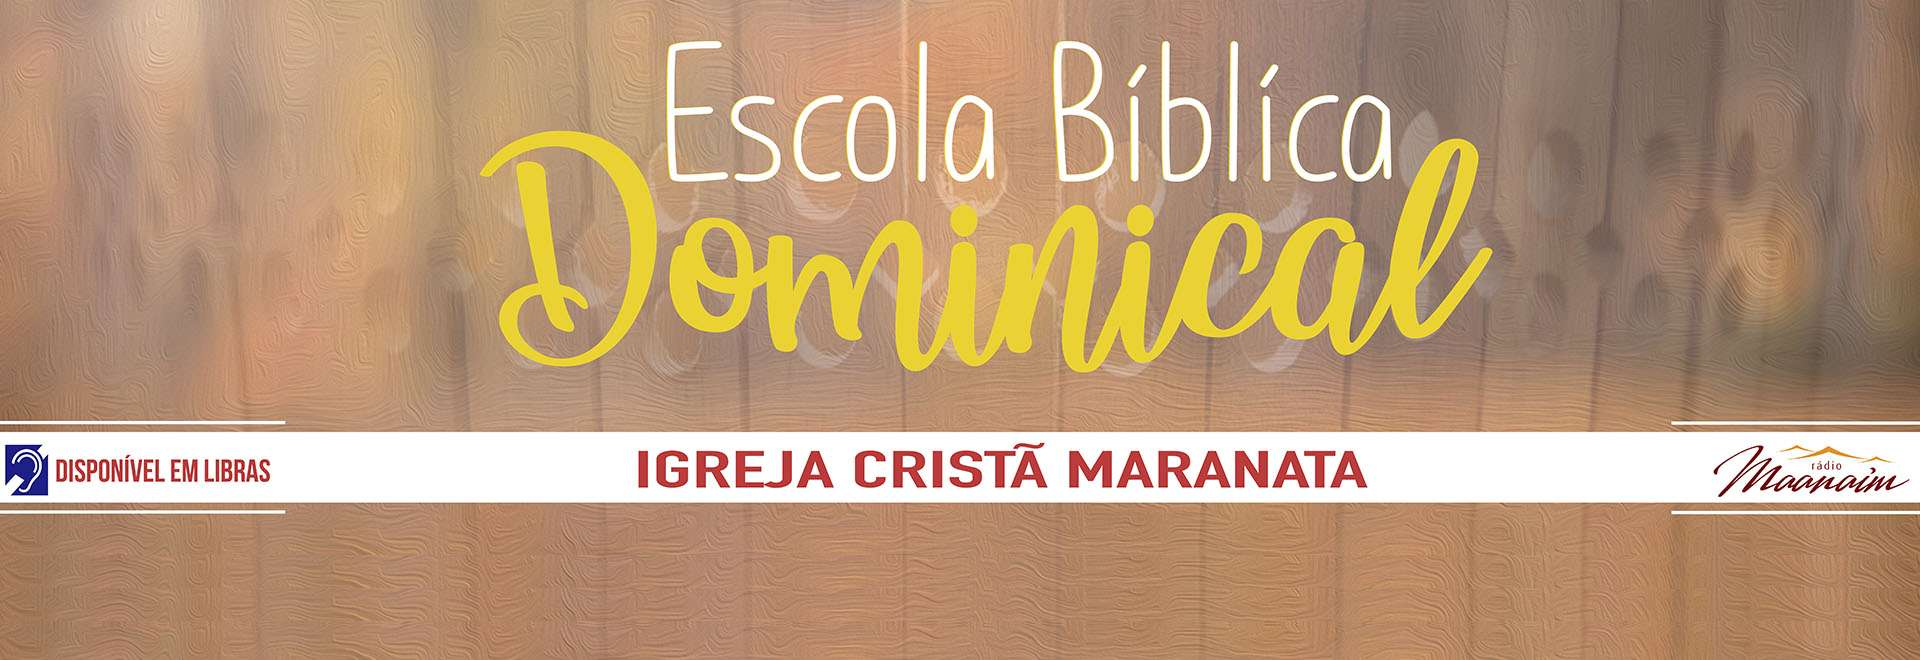 Participações da EBD da Igreja Cristã Maranata - 14/02/2021